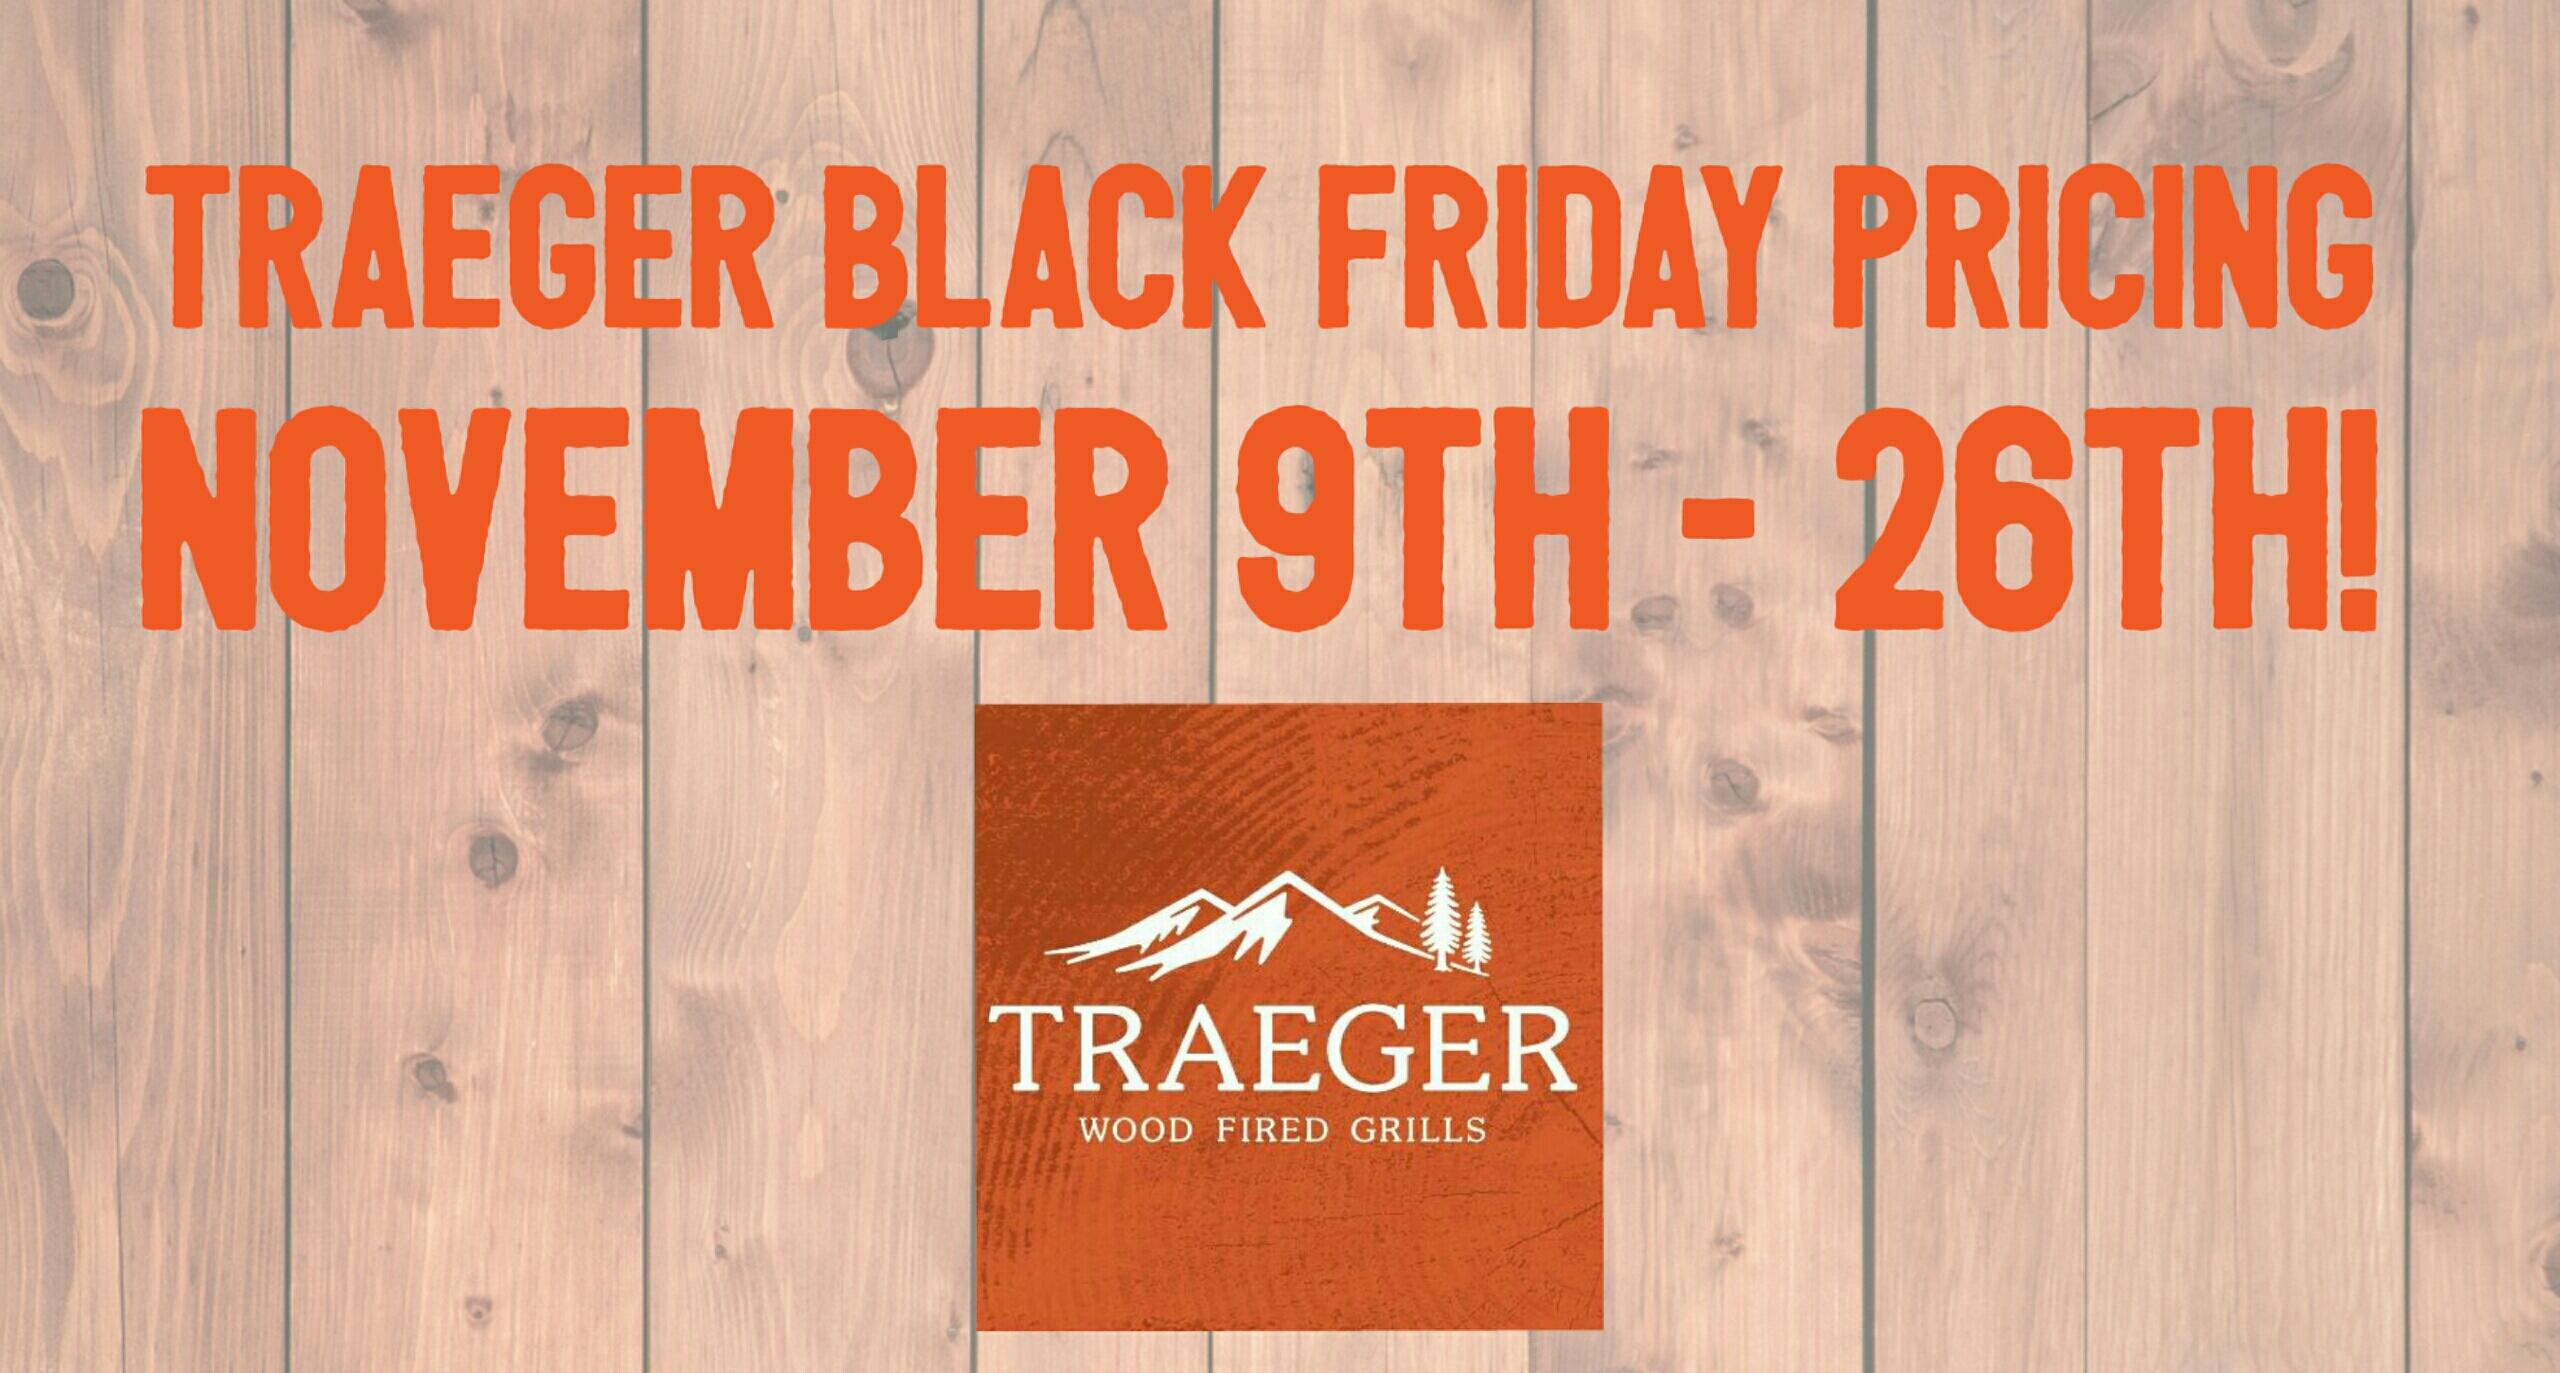 traeger black friday 2018 cover